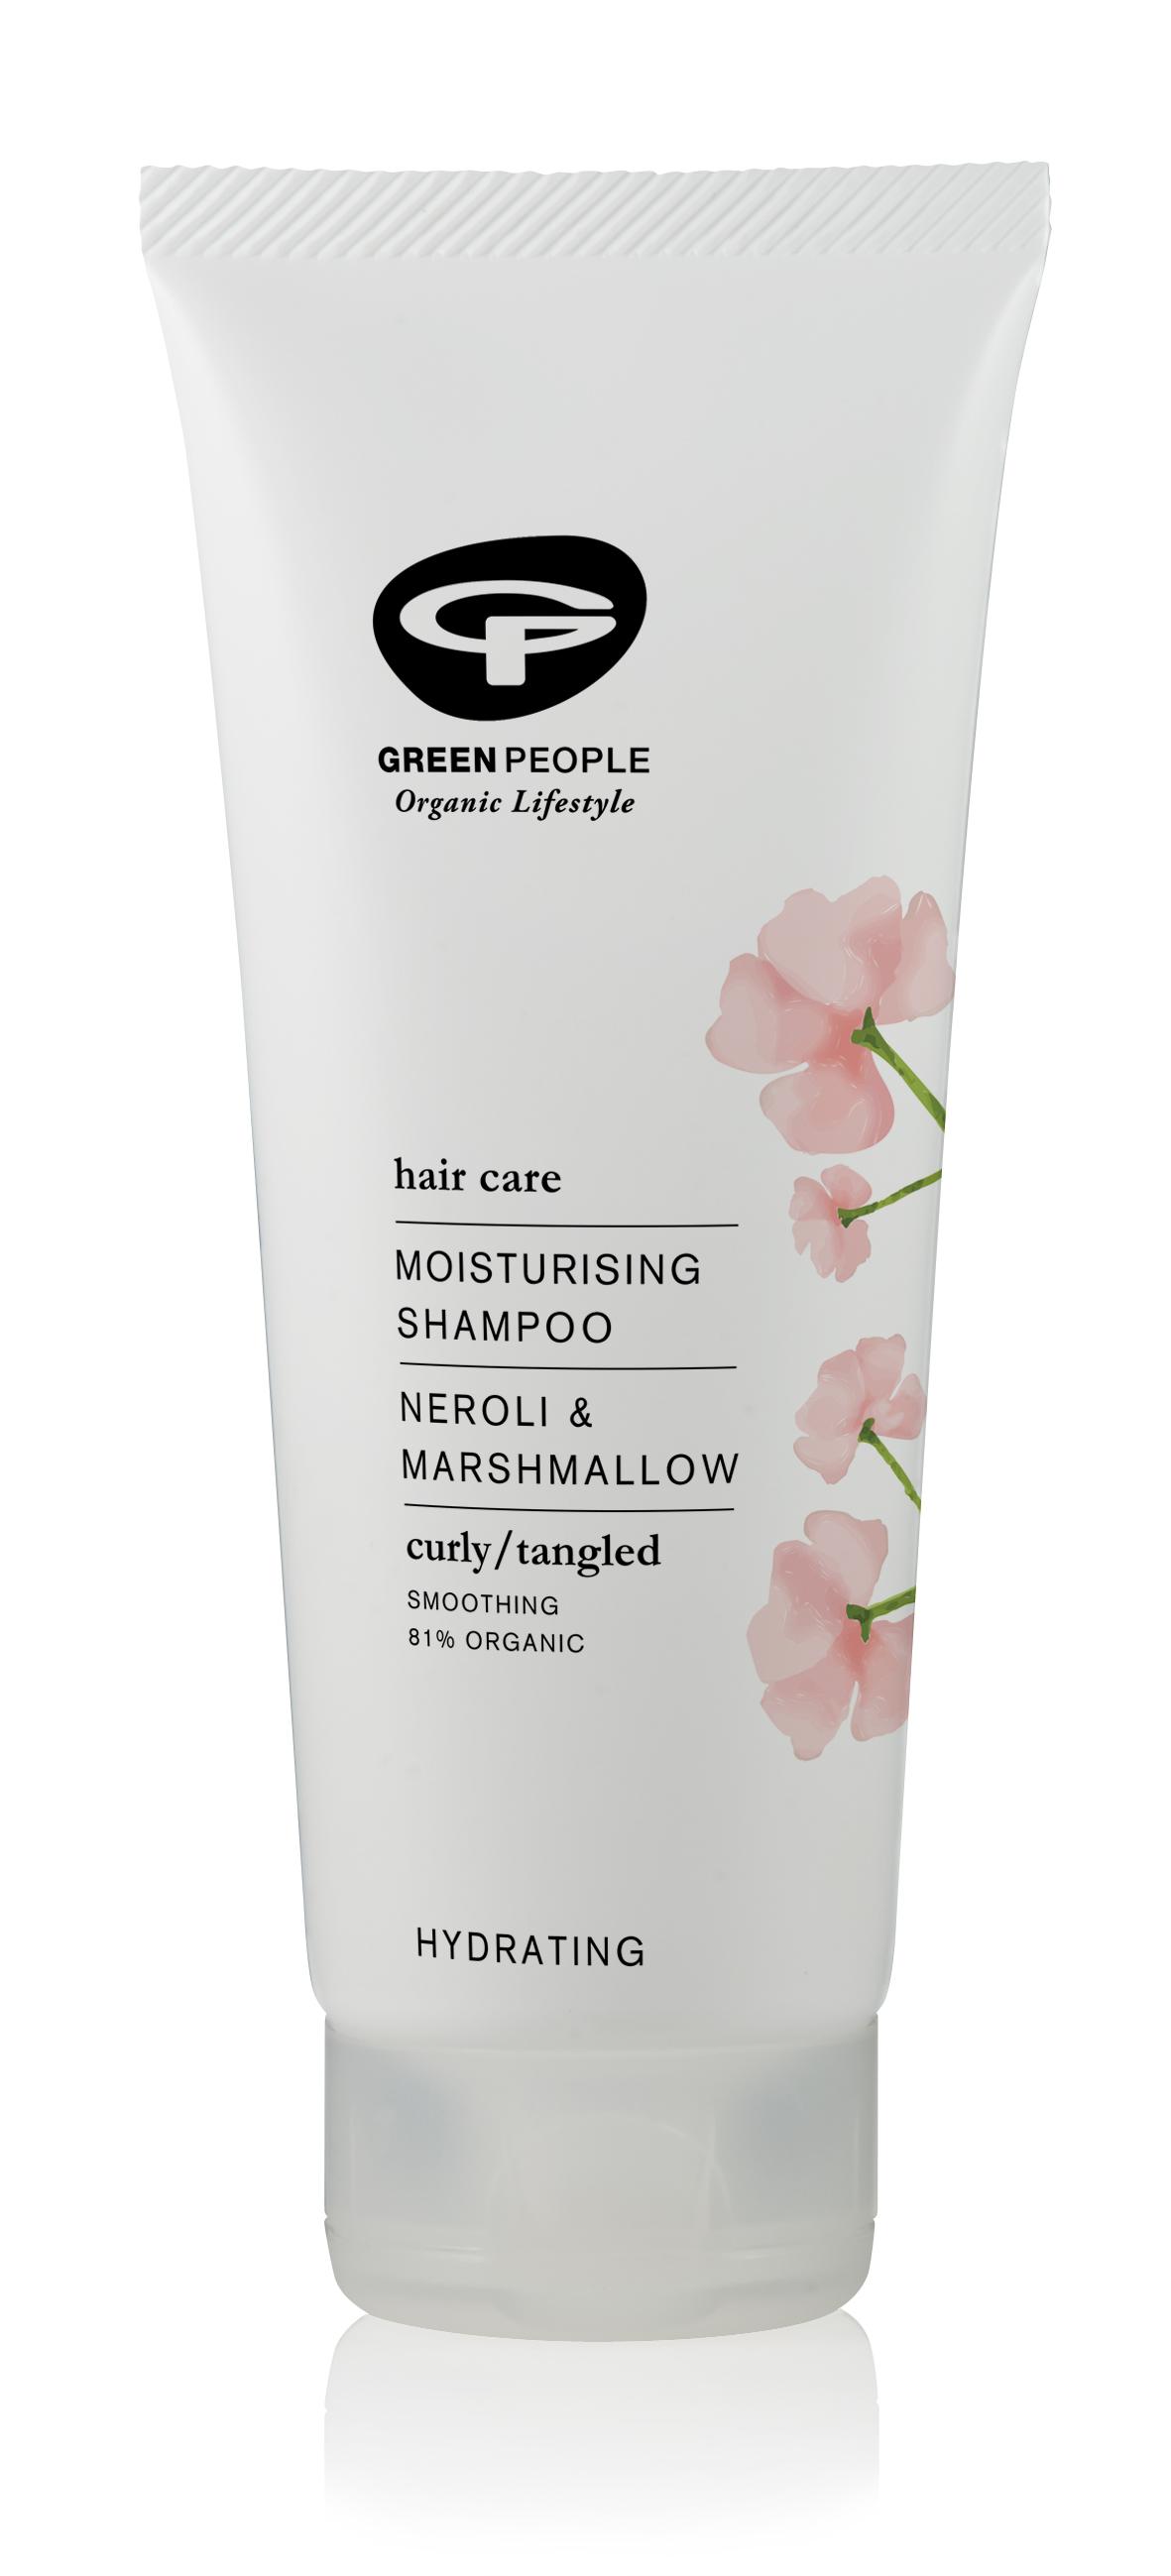 Moisturising Shampoo 200ml